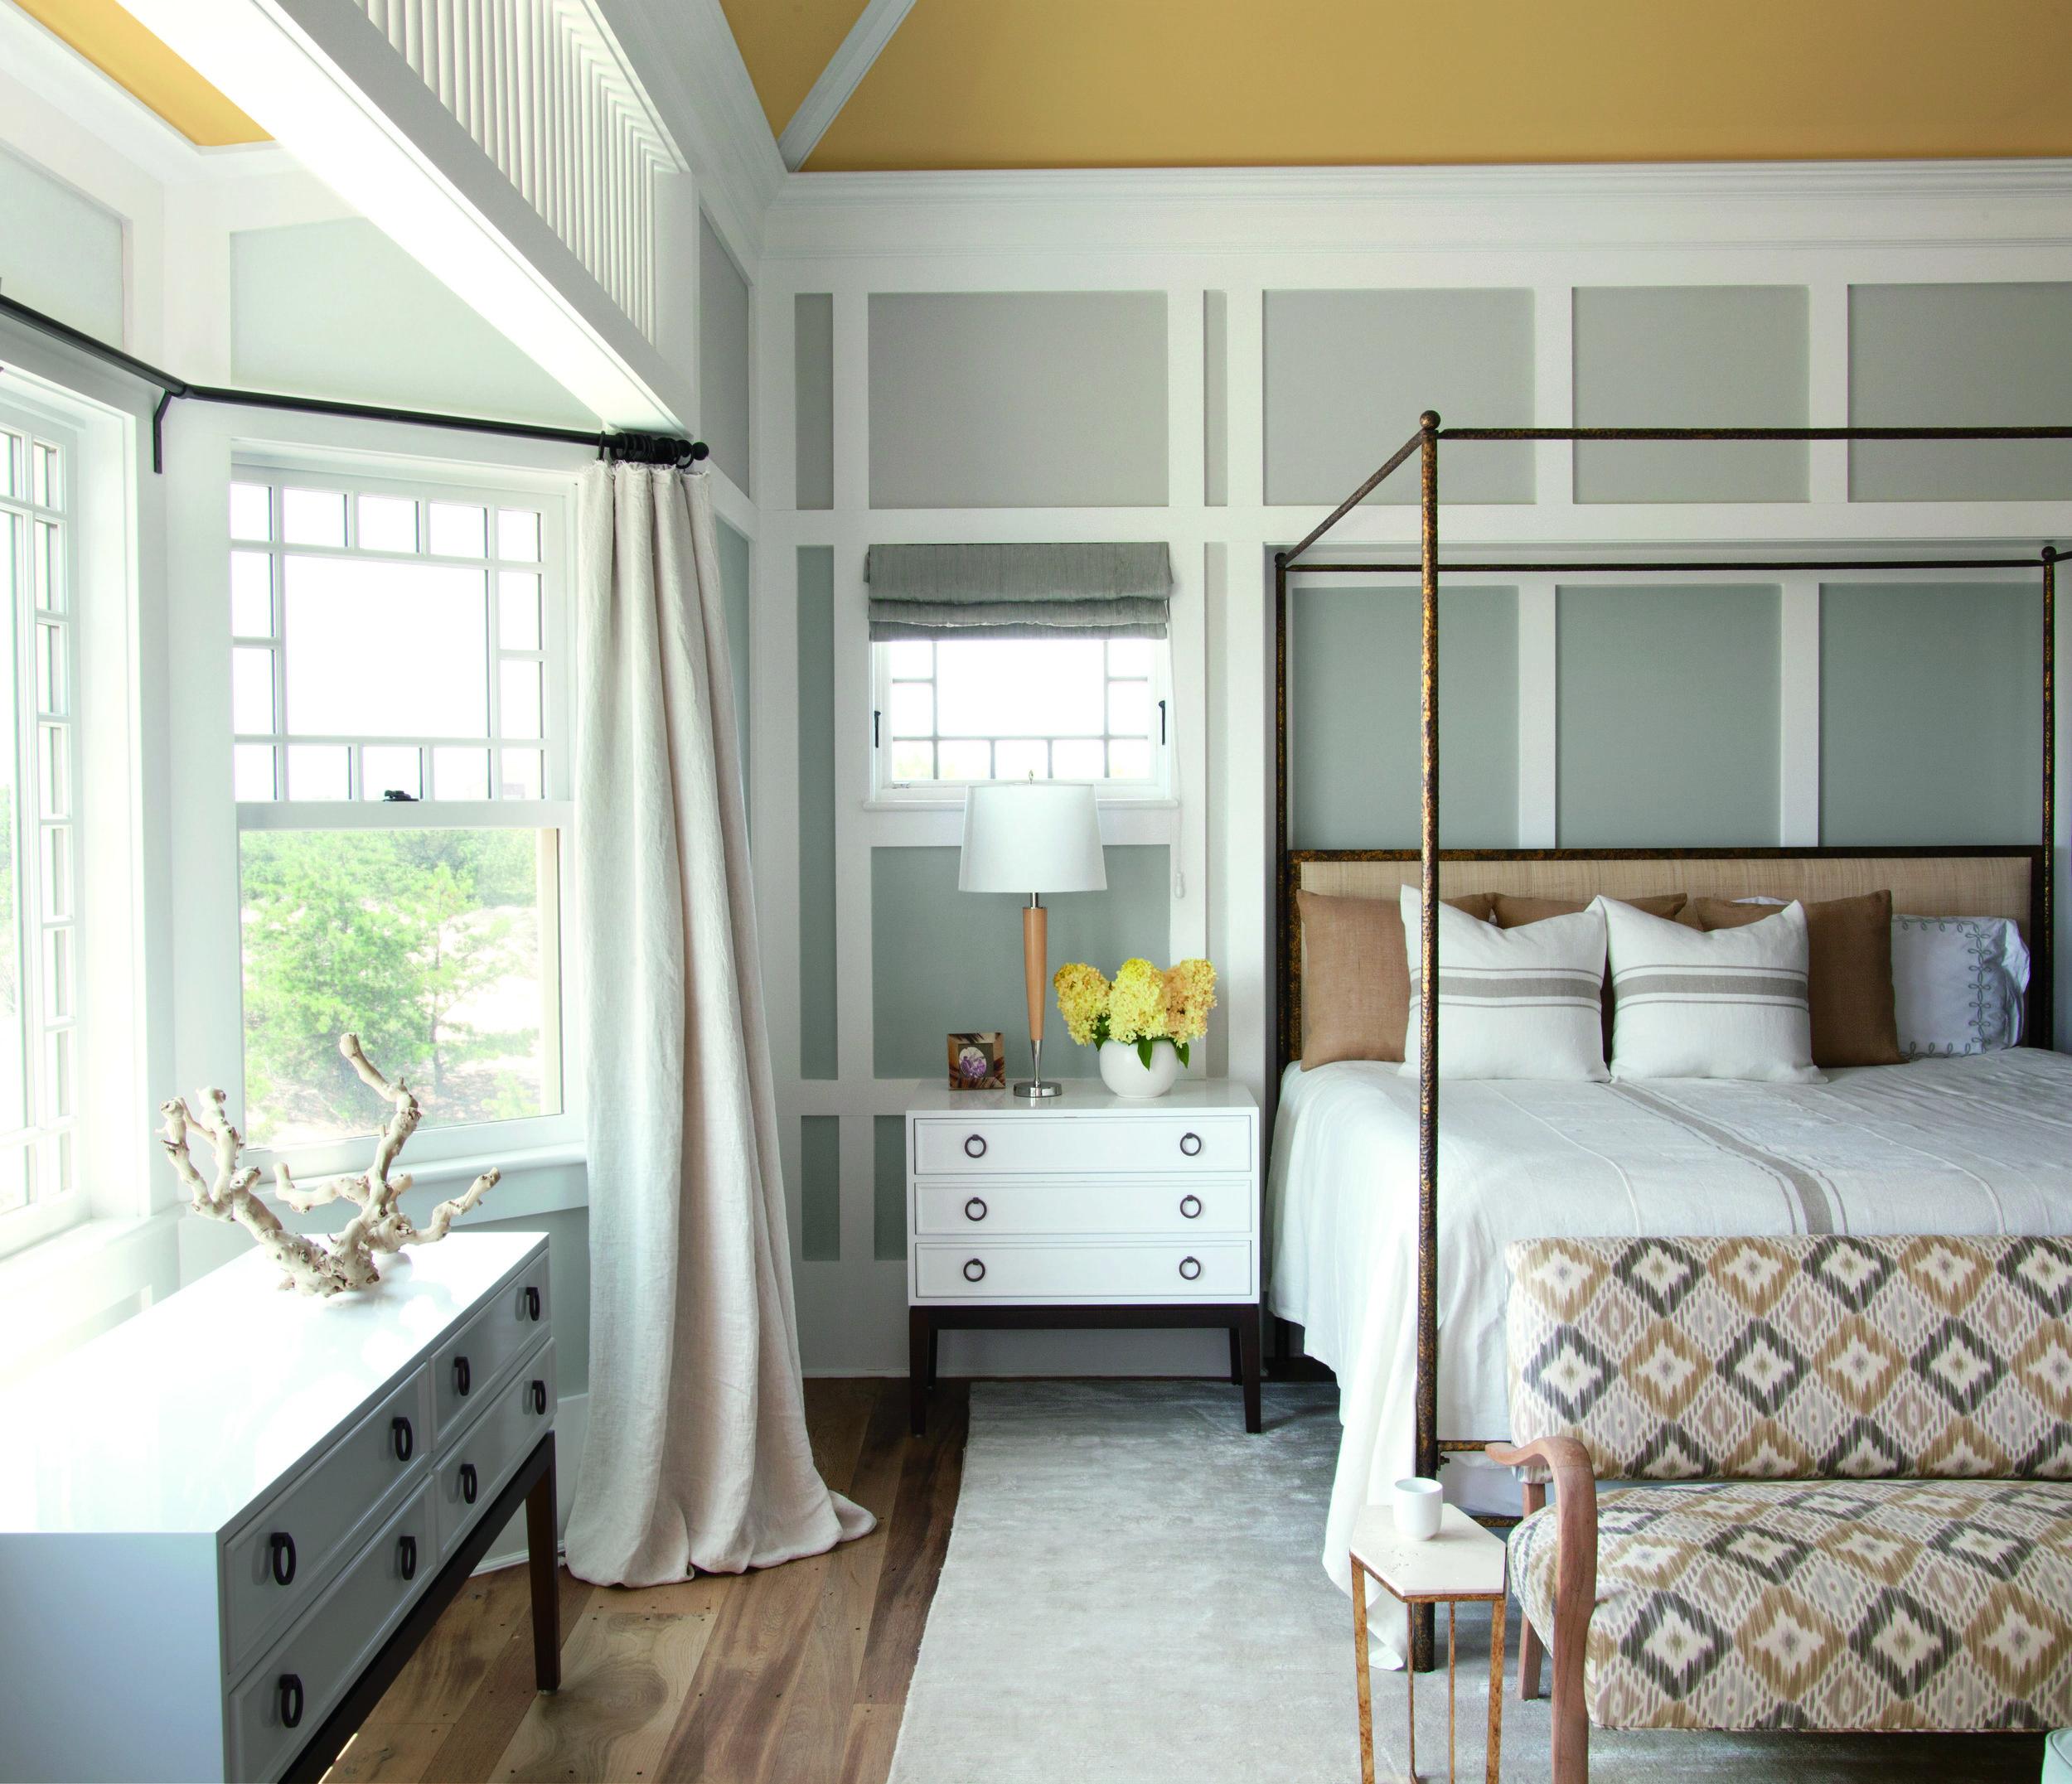 Bedroom_Lower Wall Colour_Metropolitan (AF-690)_Upper Wall Colour_Barren Plain (2111-60)_Ceiling Colour_Concord Ivory (HC-12).jpg